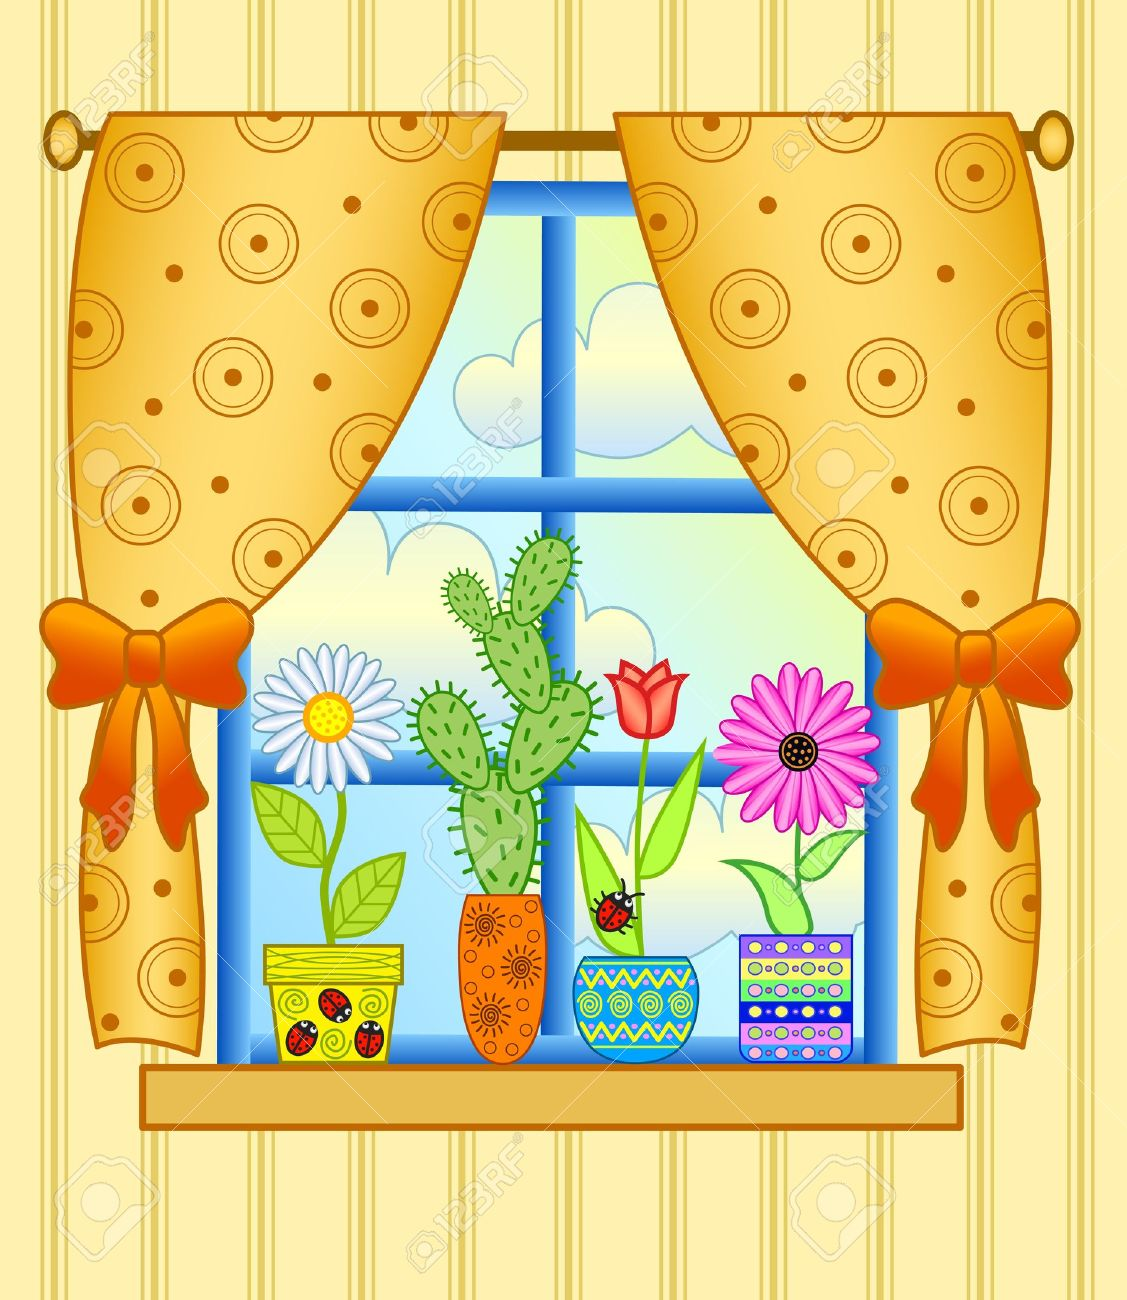 Window curtain clipart.